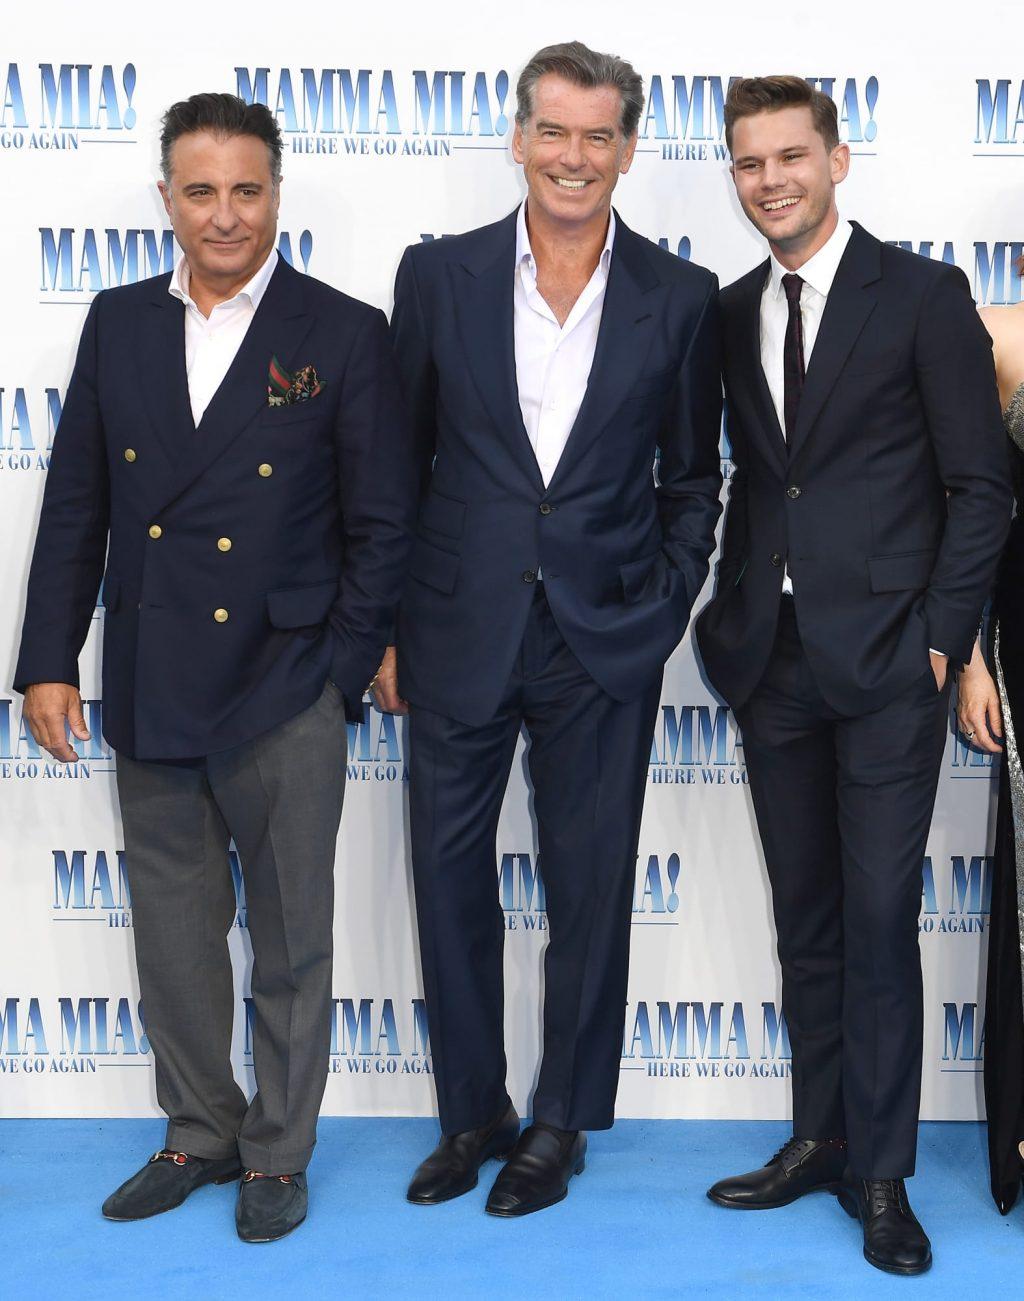 tham do cong chieu phim Mamma Mia 9